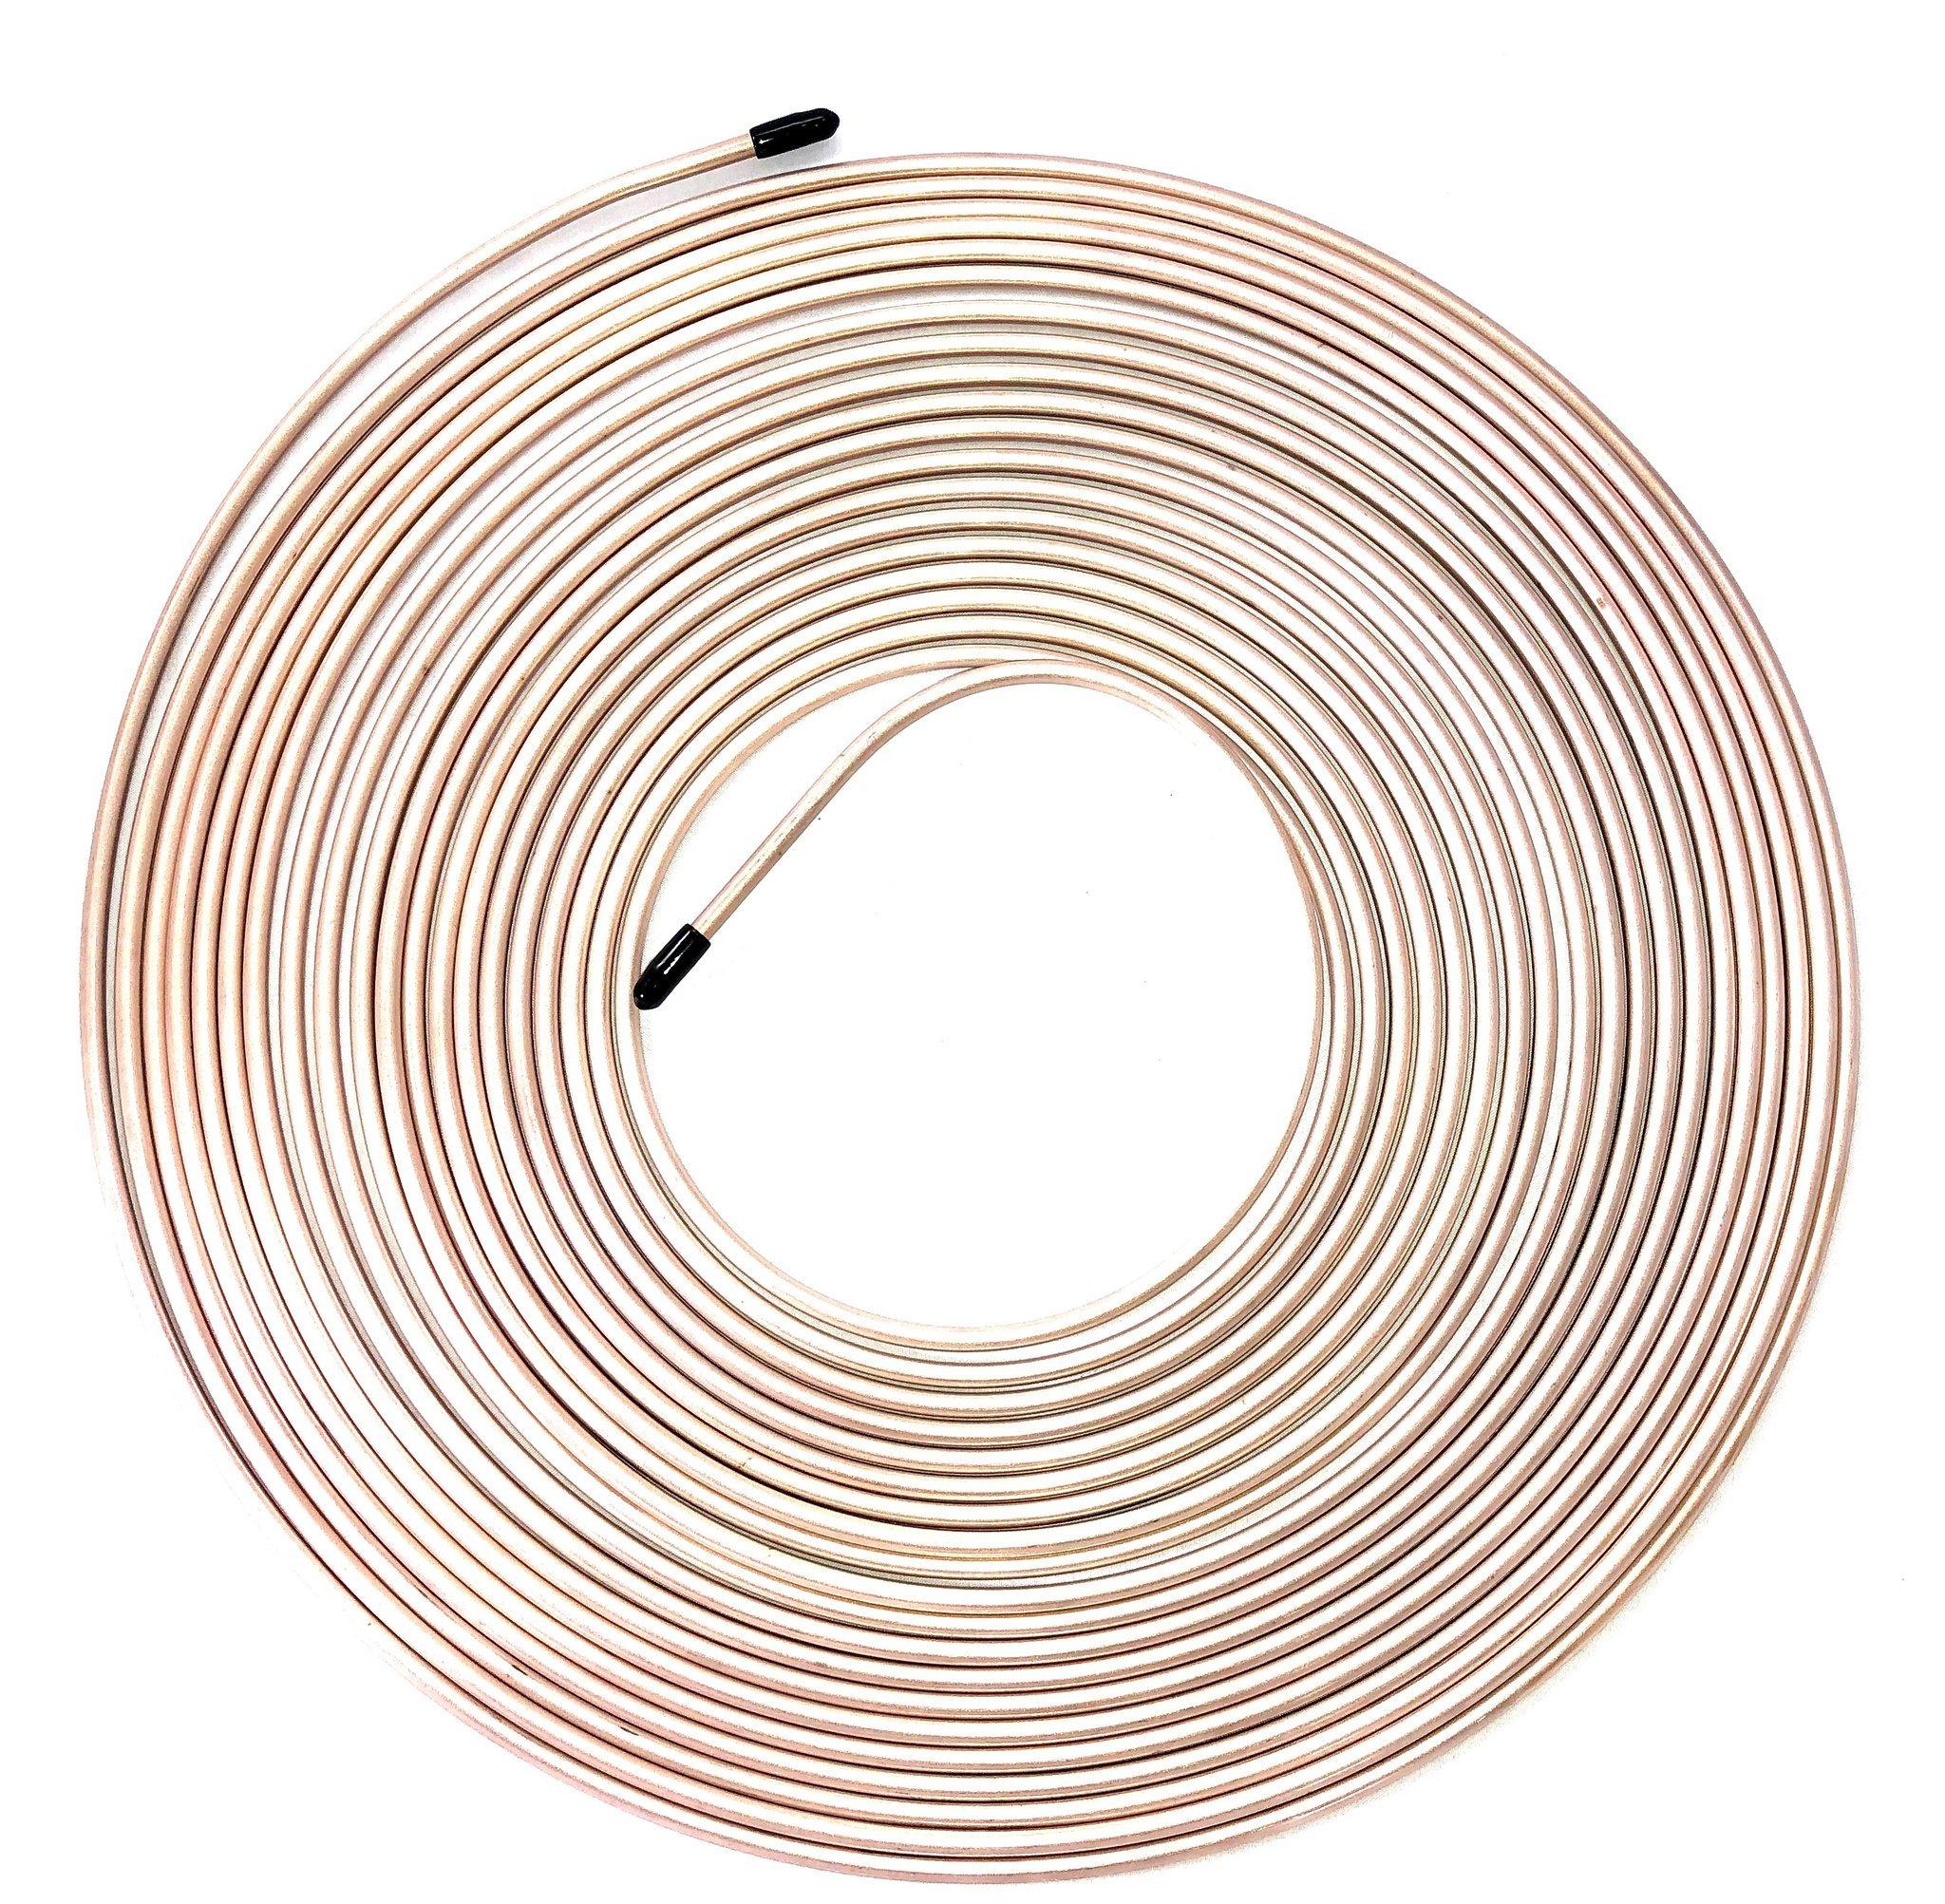 50 Ft Roll of 3//16 Copper Nickel Brake Line Tubing